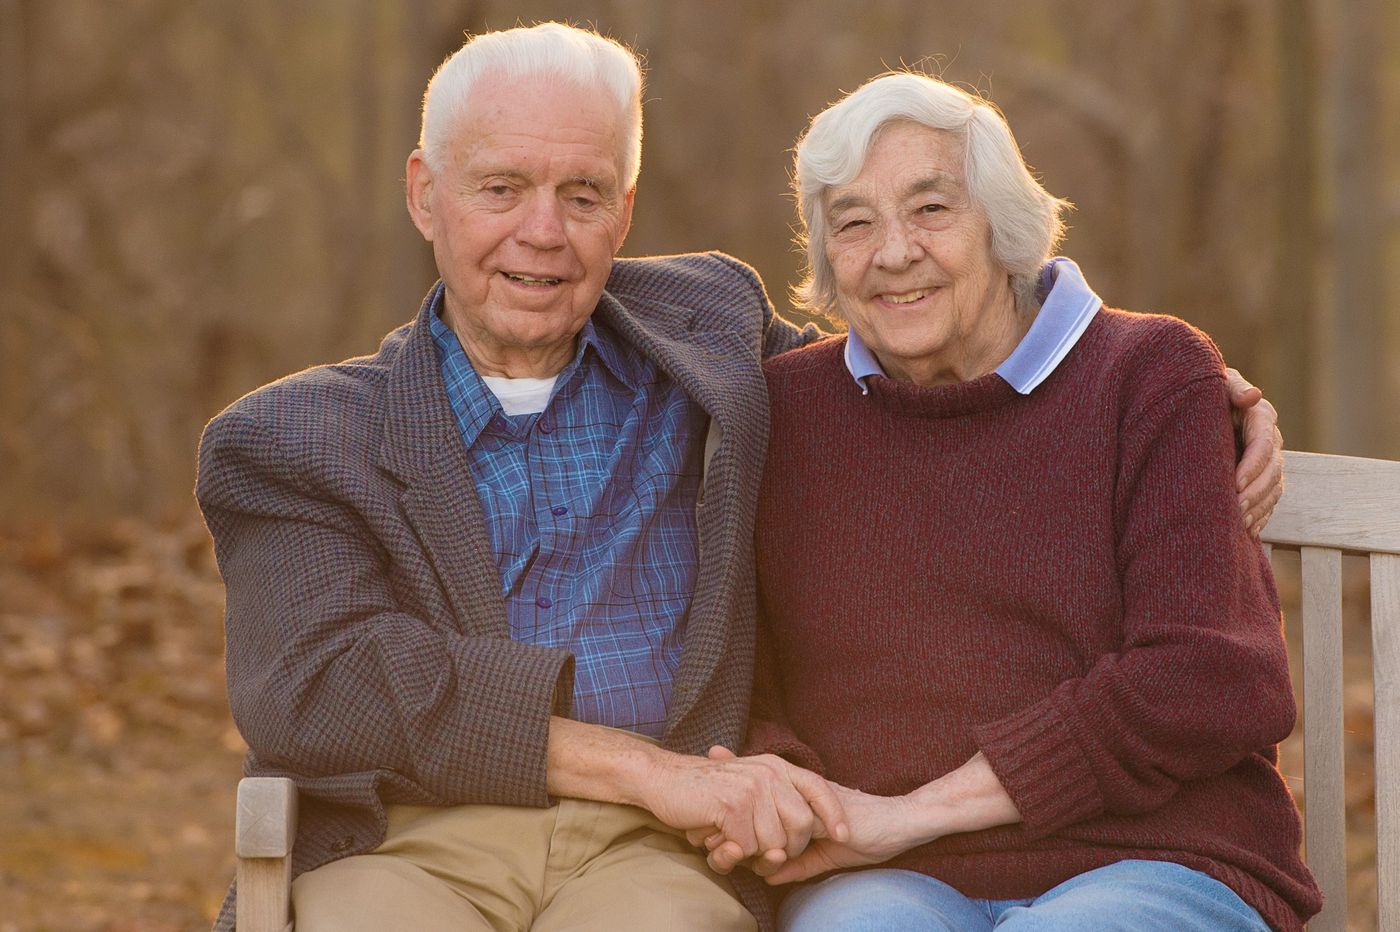 Margaret Linvill, 88, matriarch of the Linvilla Orchards family